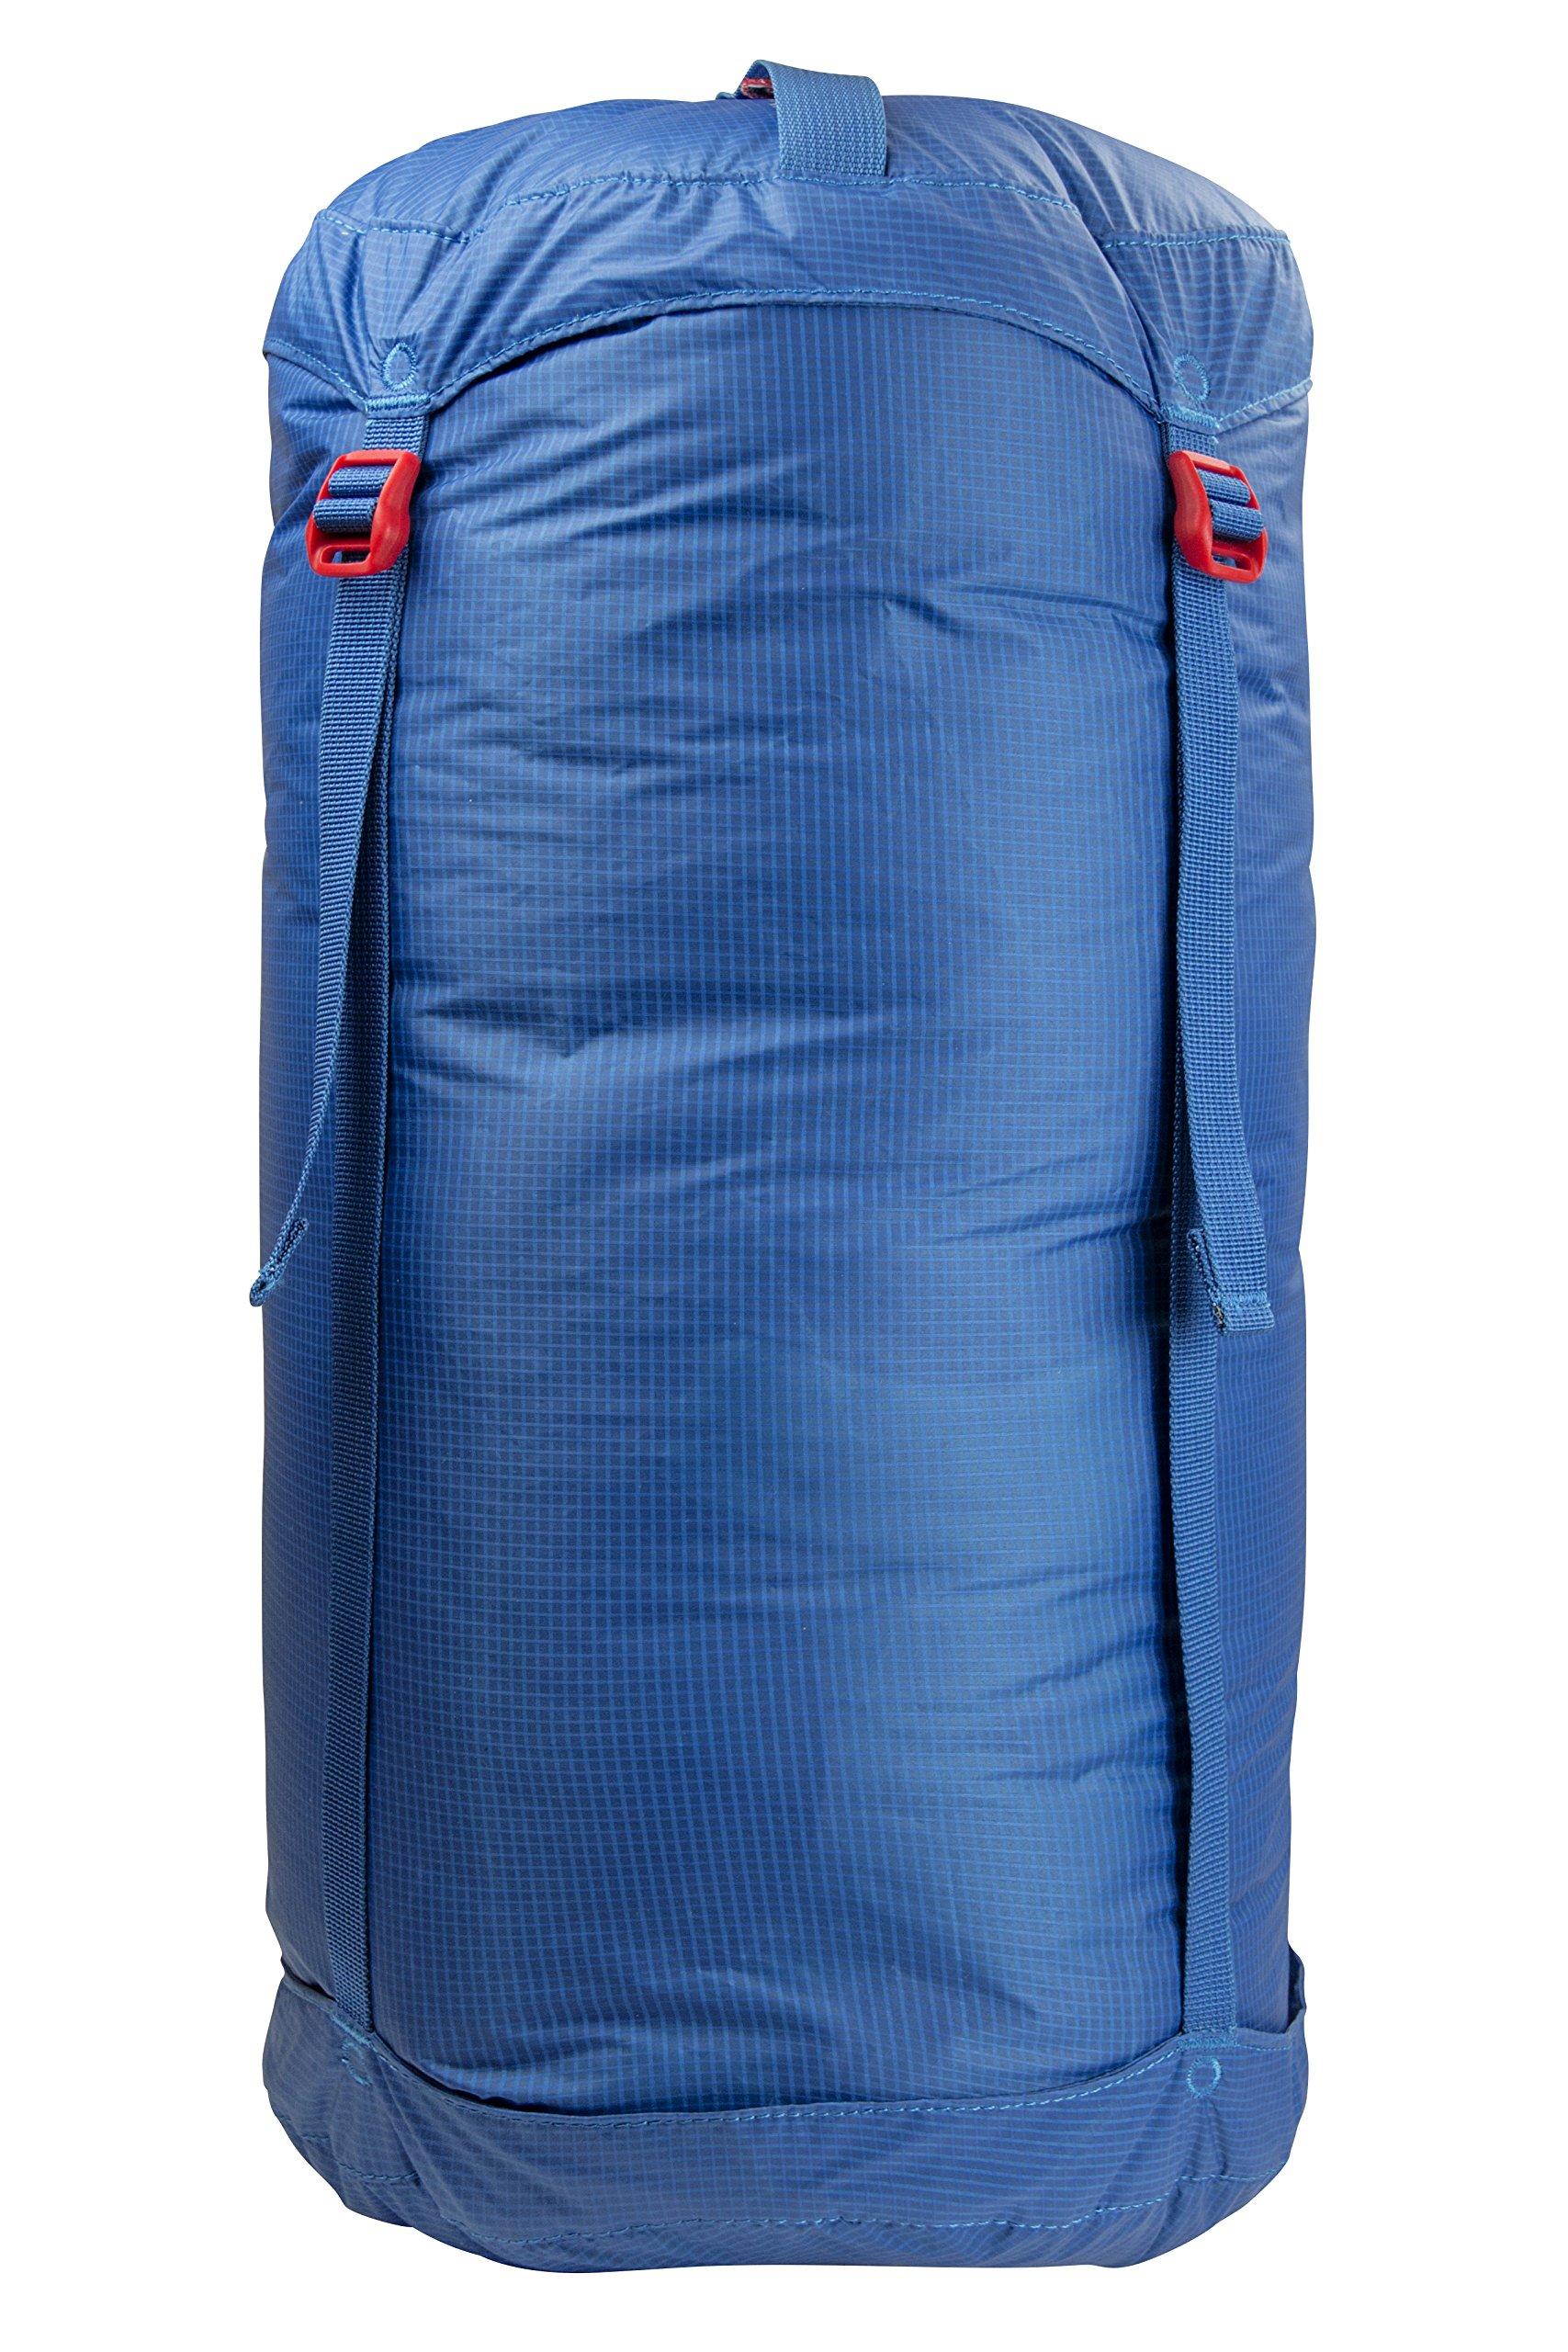 Big Agnes Tech Compression Sack, Blue, 21L by Big Agnes